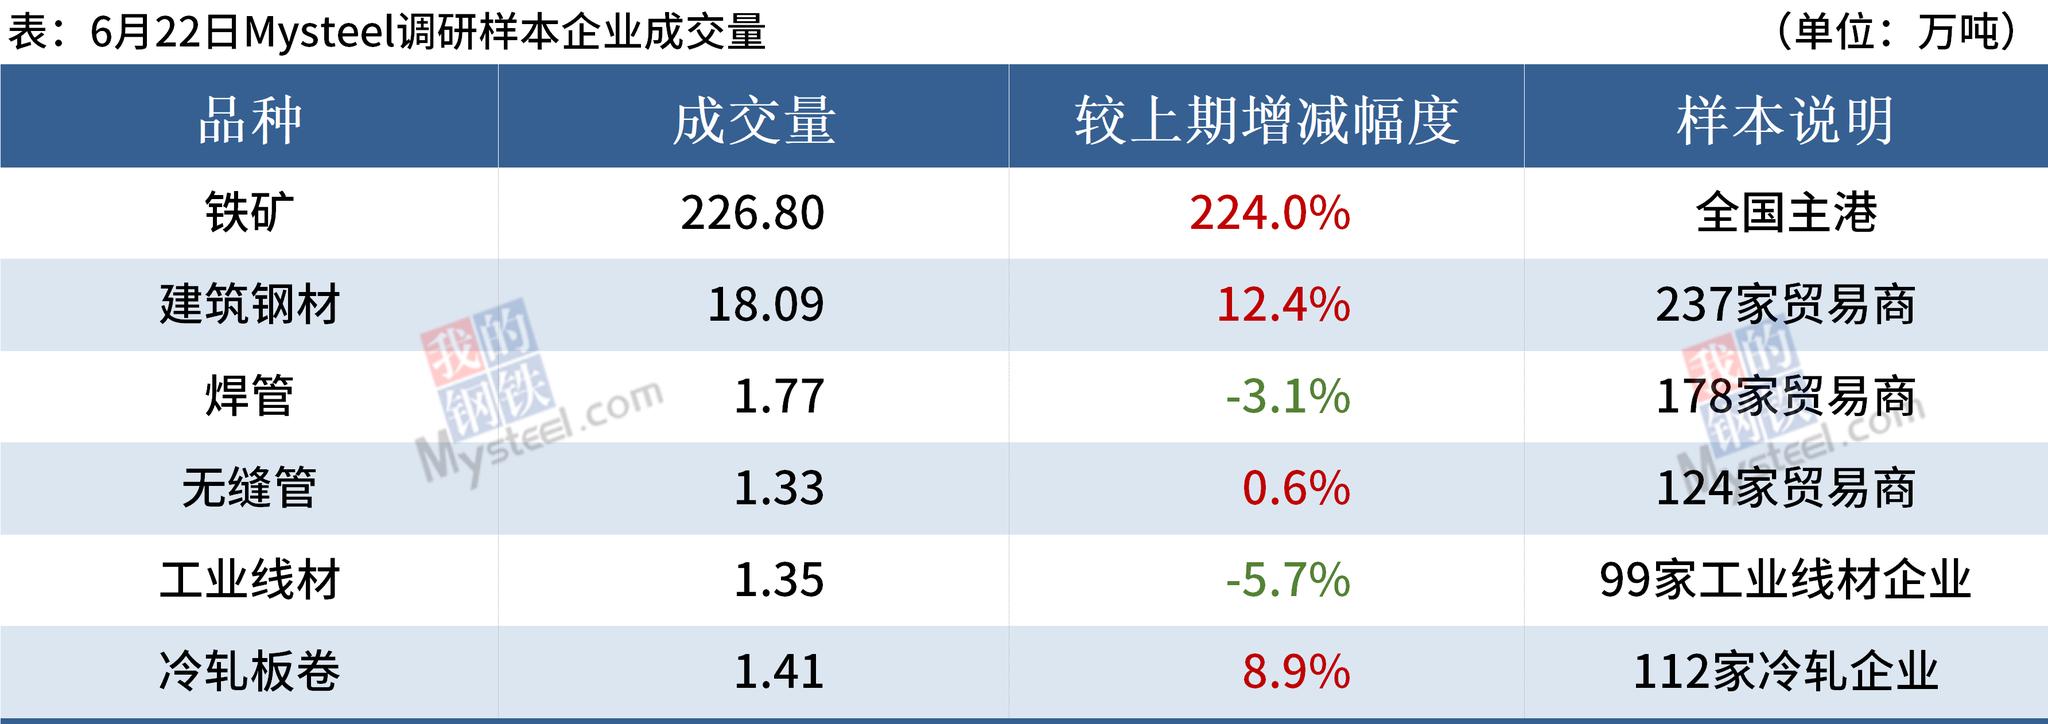 Mysteel早读:钢厂大范围降价,铁矿日成交量创8个月新高